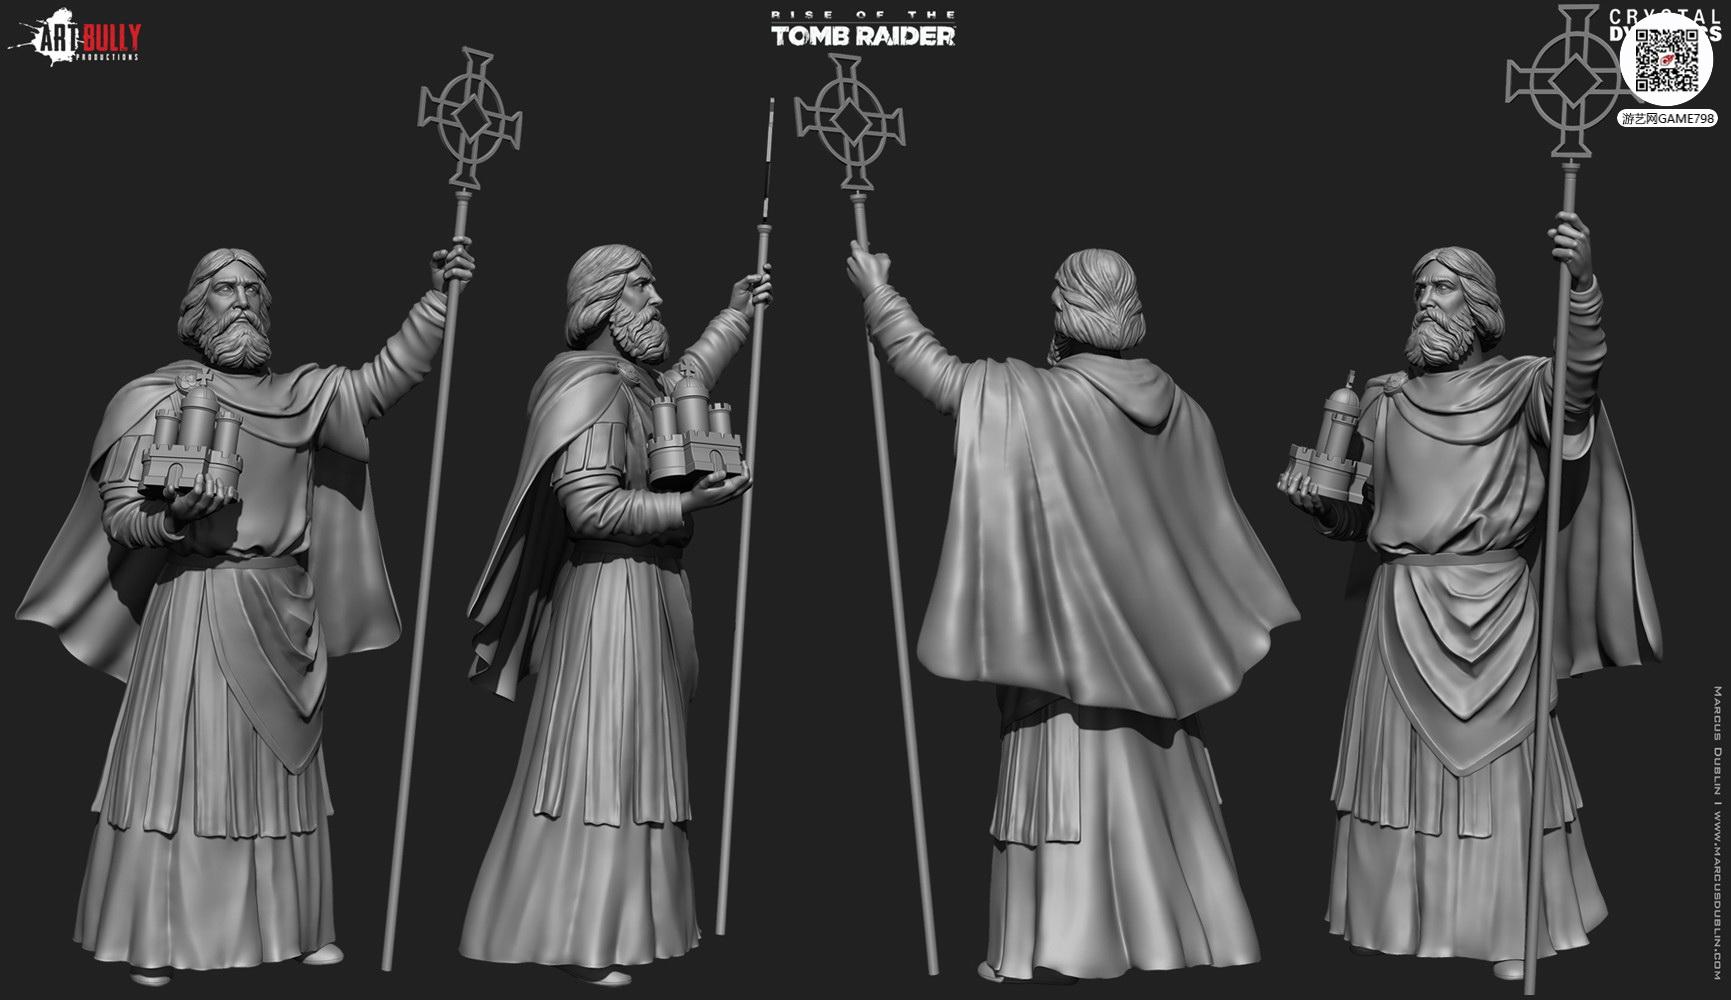 3A大作古墓丽影:崛起场景雕像次世代3D模型下载